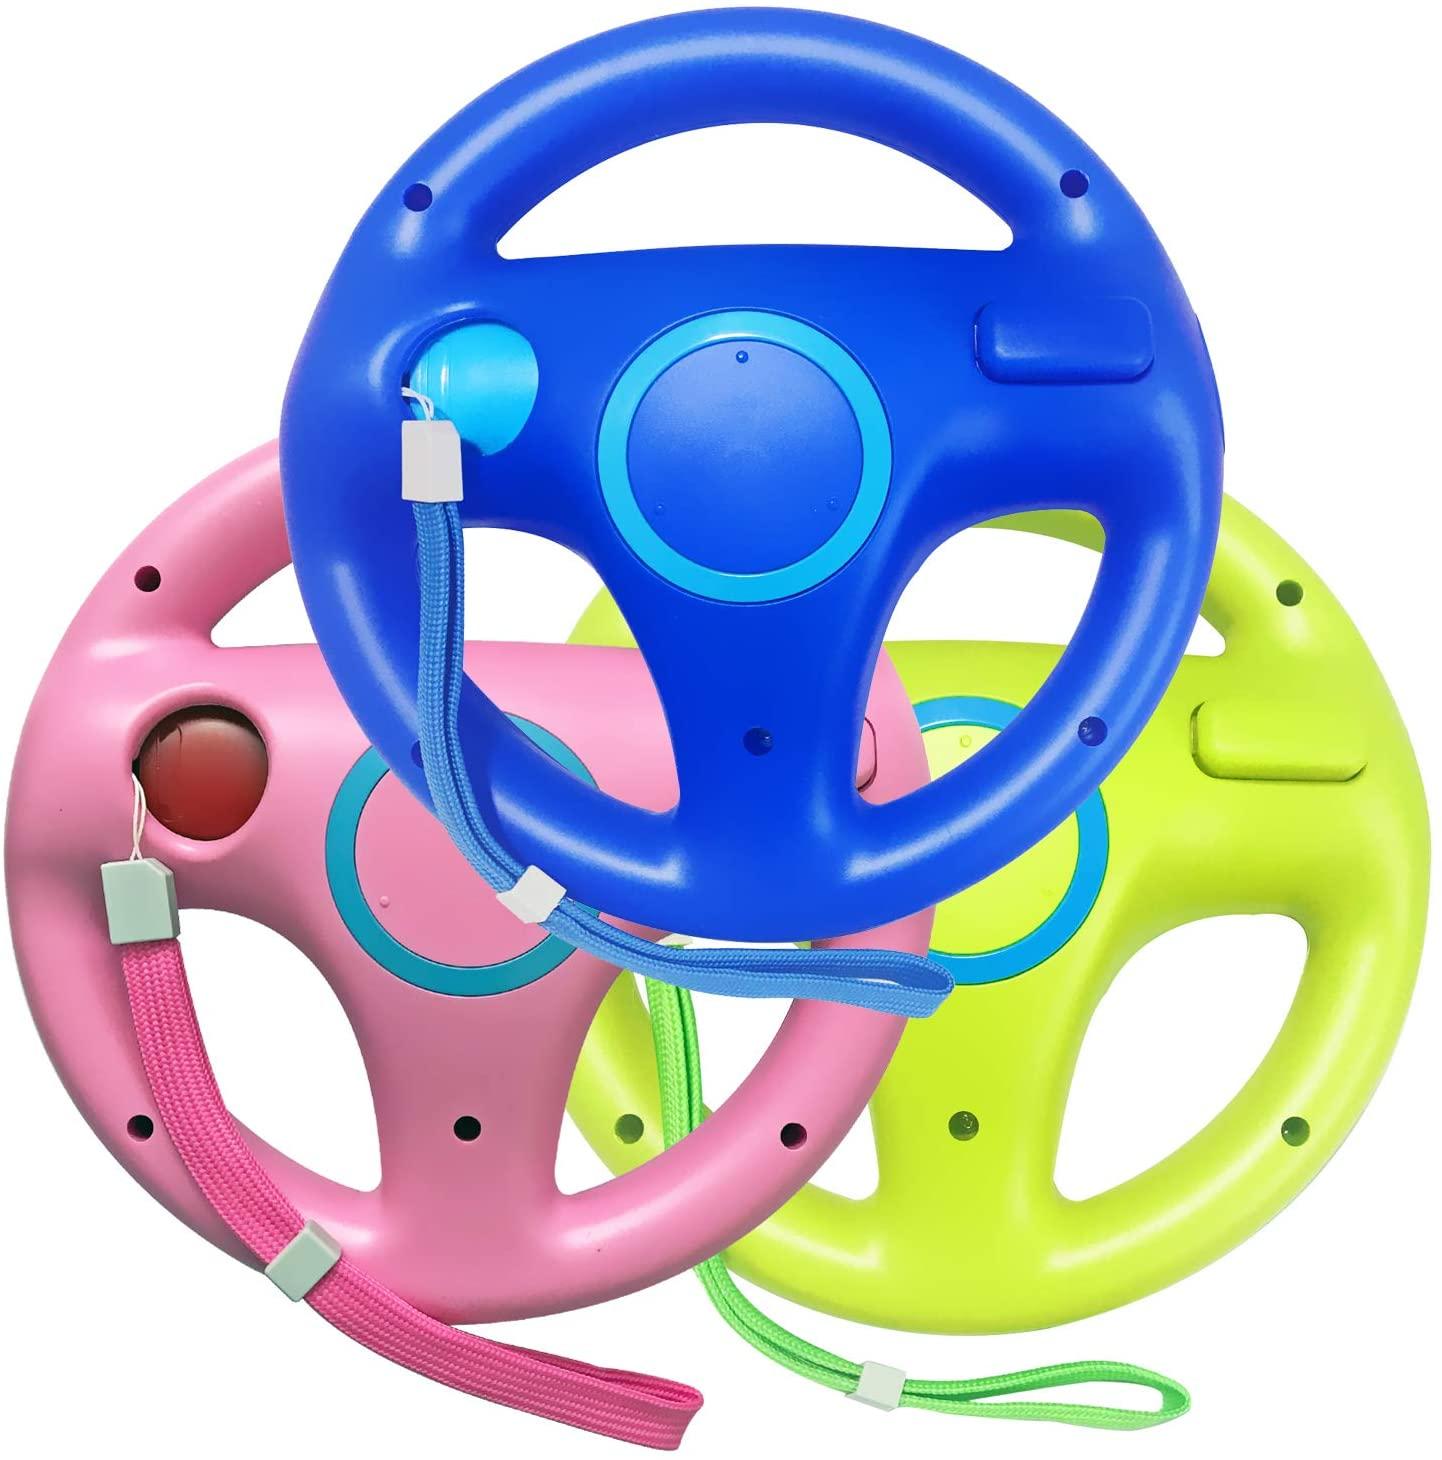 Jadebones 3PCS Blue Pink Green Mario Kart Steering Wheel with Wrist Strap for Wii and Wii U